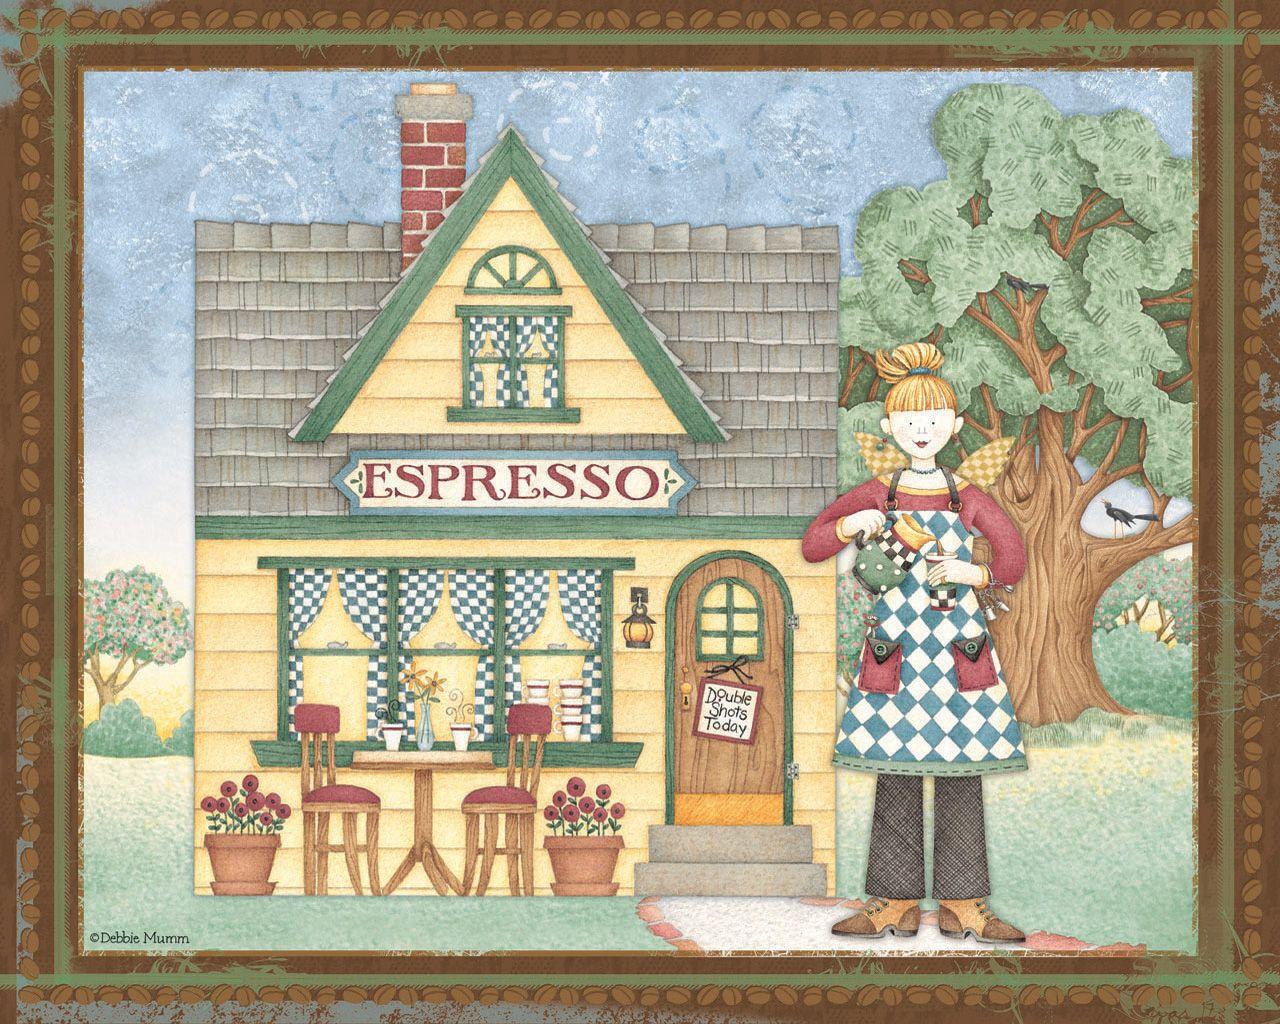 Debbie Mumm Wallpaper Always Has A Debbie Mumm Design On